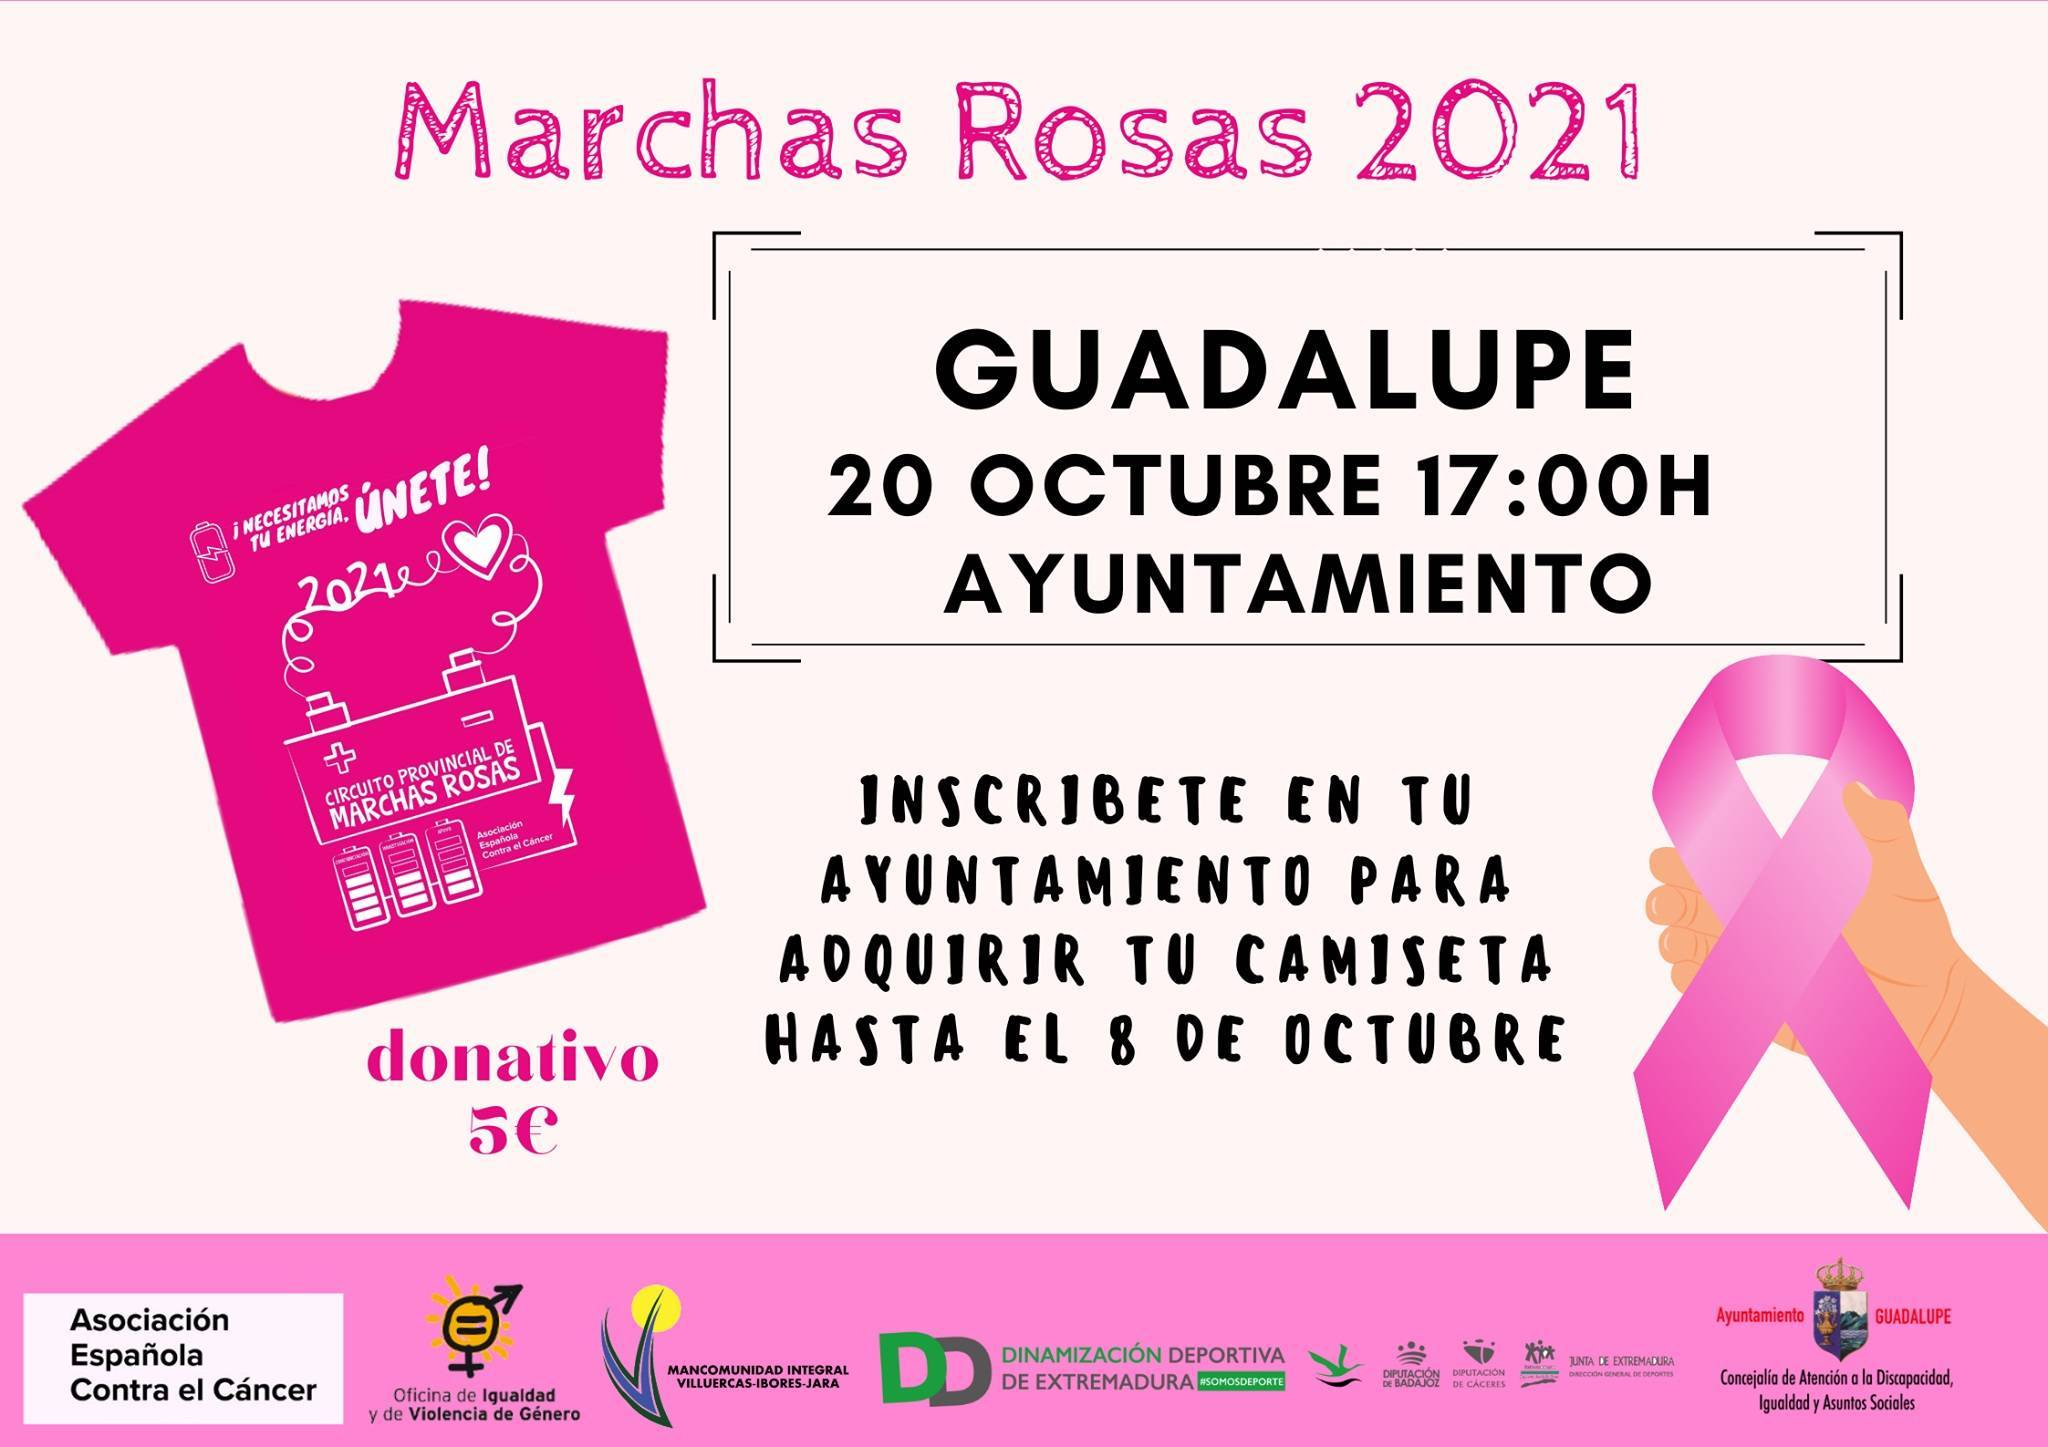 Marchas rosas (2021) - Guadalupe (Cáceres)